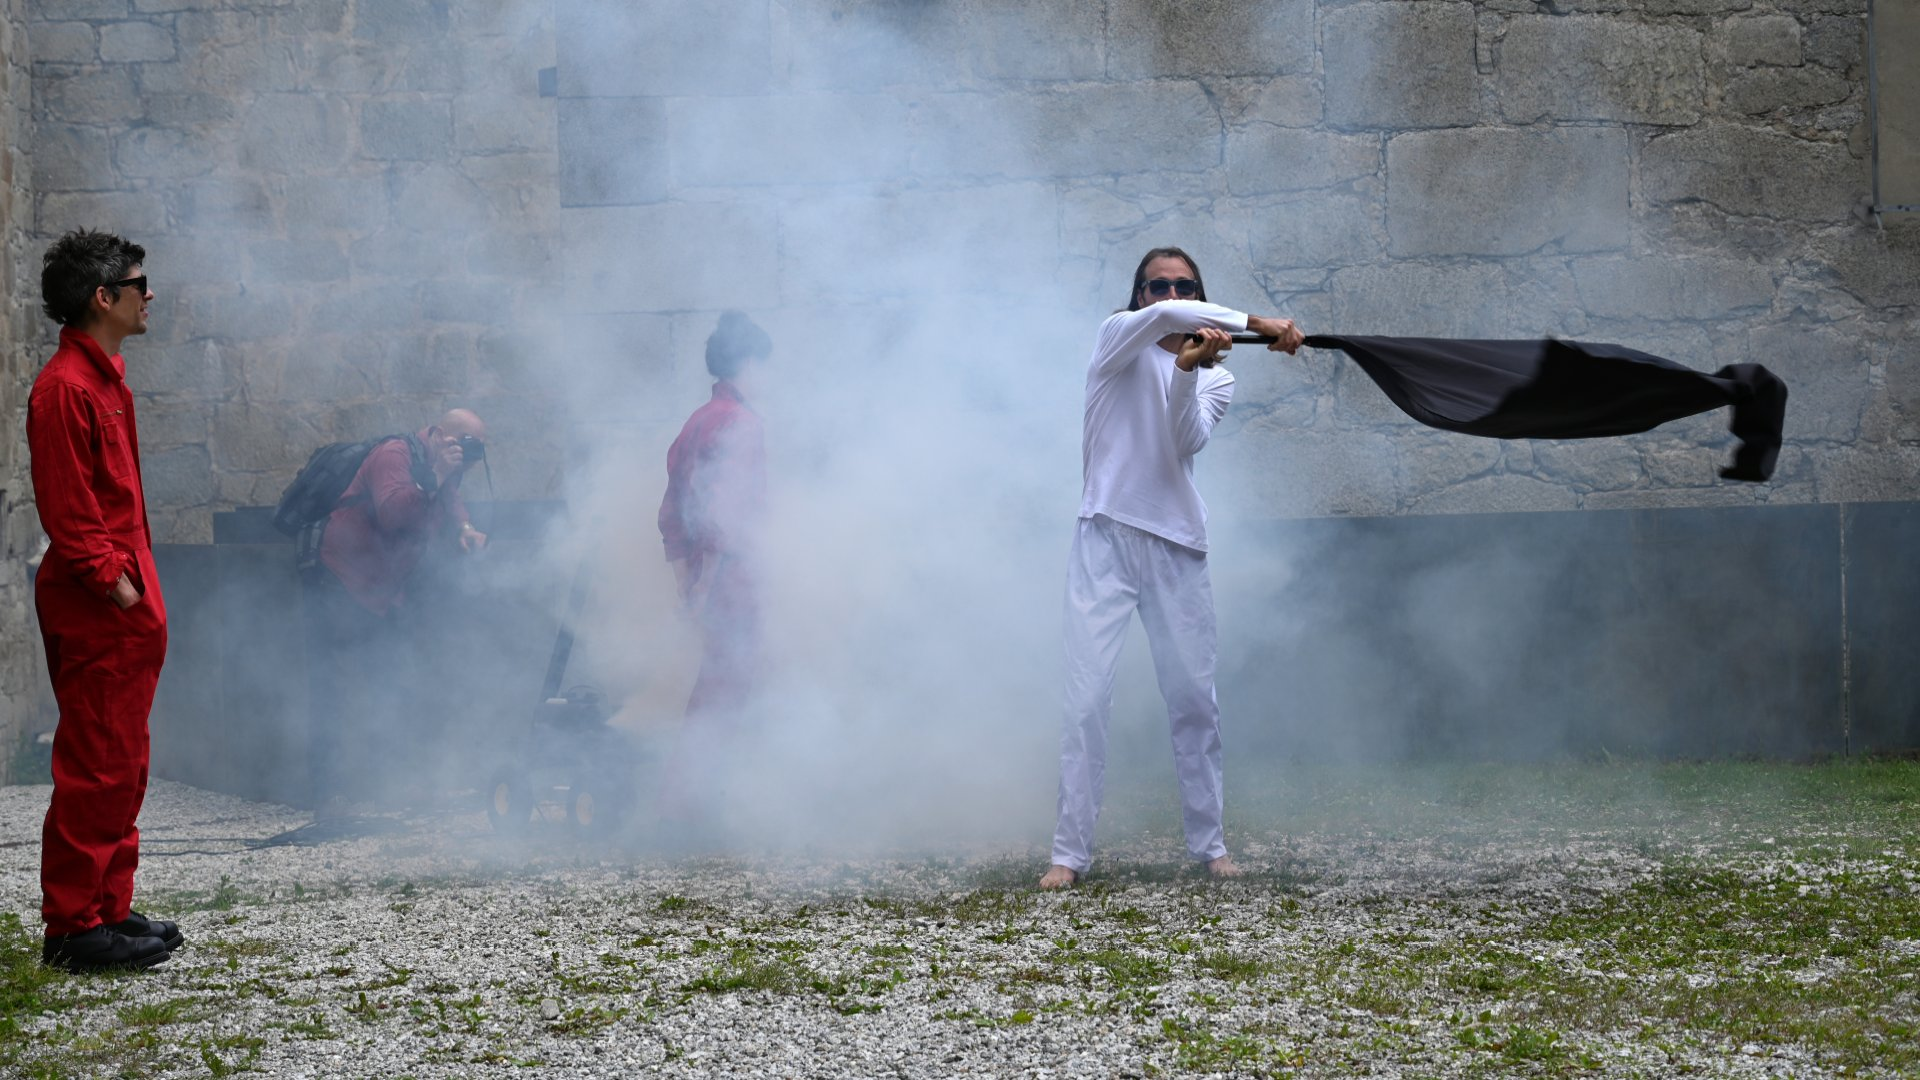 Opferung_ExperimentalSetup_Festung_franzenfeste2021_hic_sunt_dragones_Aktion_3